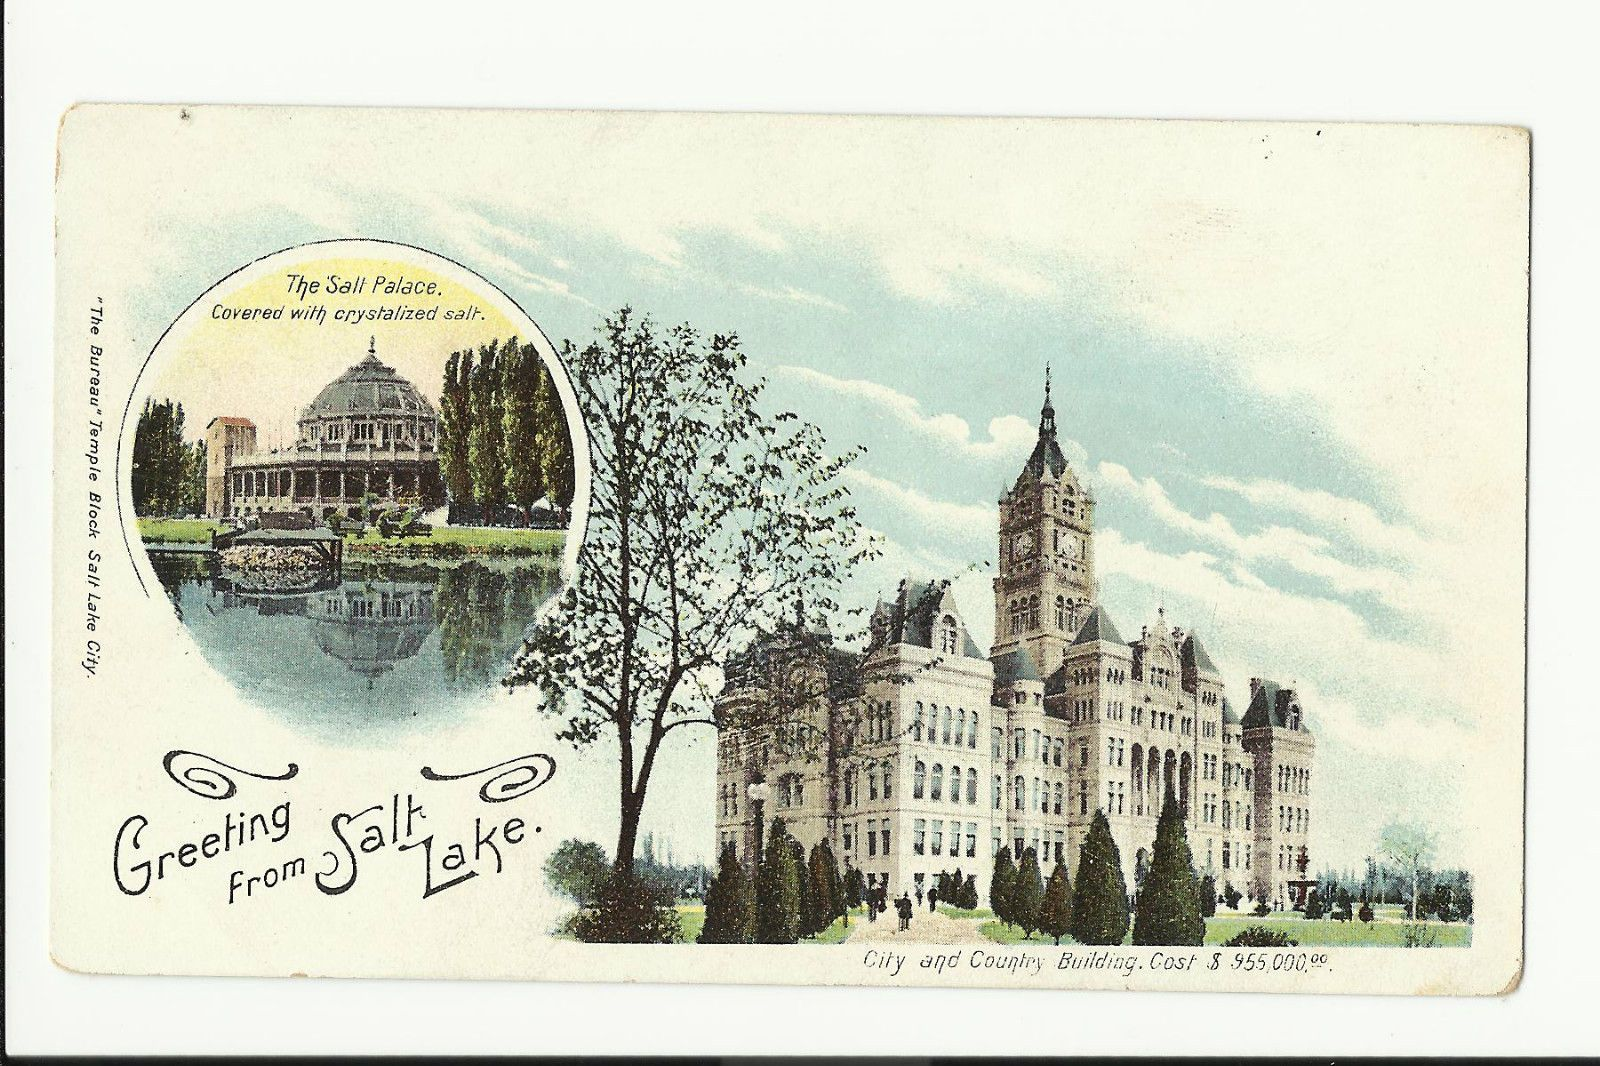 Greeting from salt lake city utah postcard utah postcards greeting from salt lake city utah postcard kristyandbryce Image collections